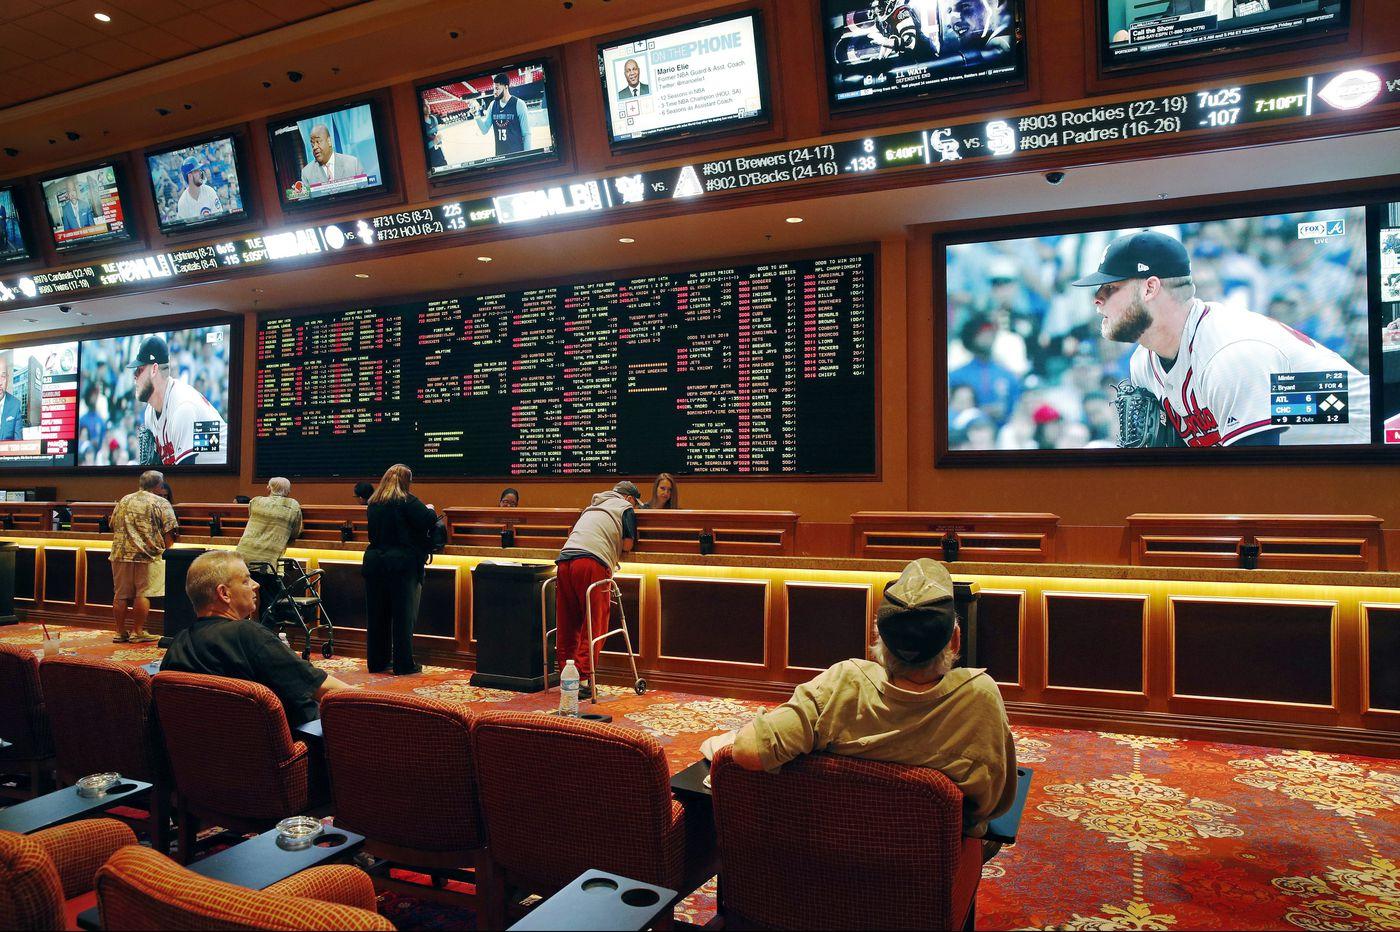 sportsbook ocean hard resort rock casino sports atlantic vegas las open silent hotel gambling casinos revels while its point south